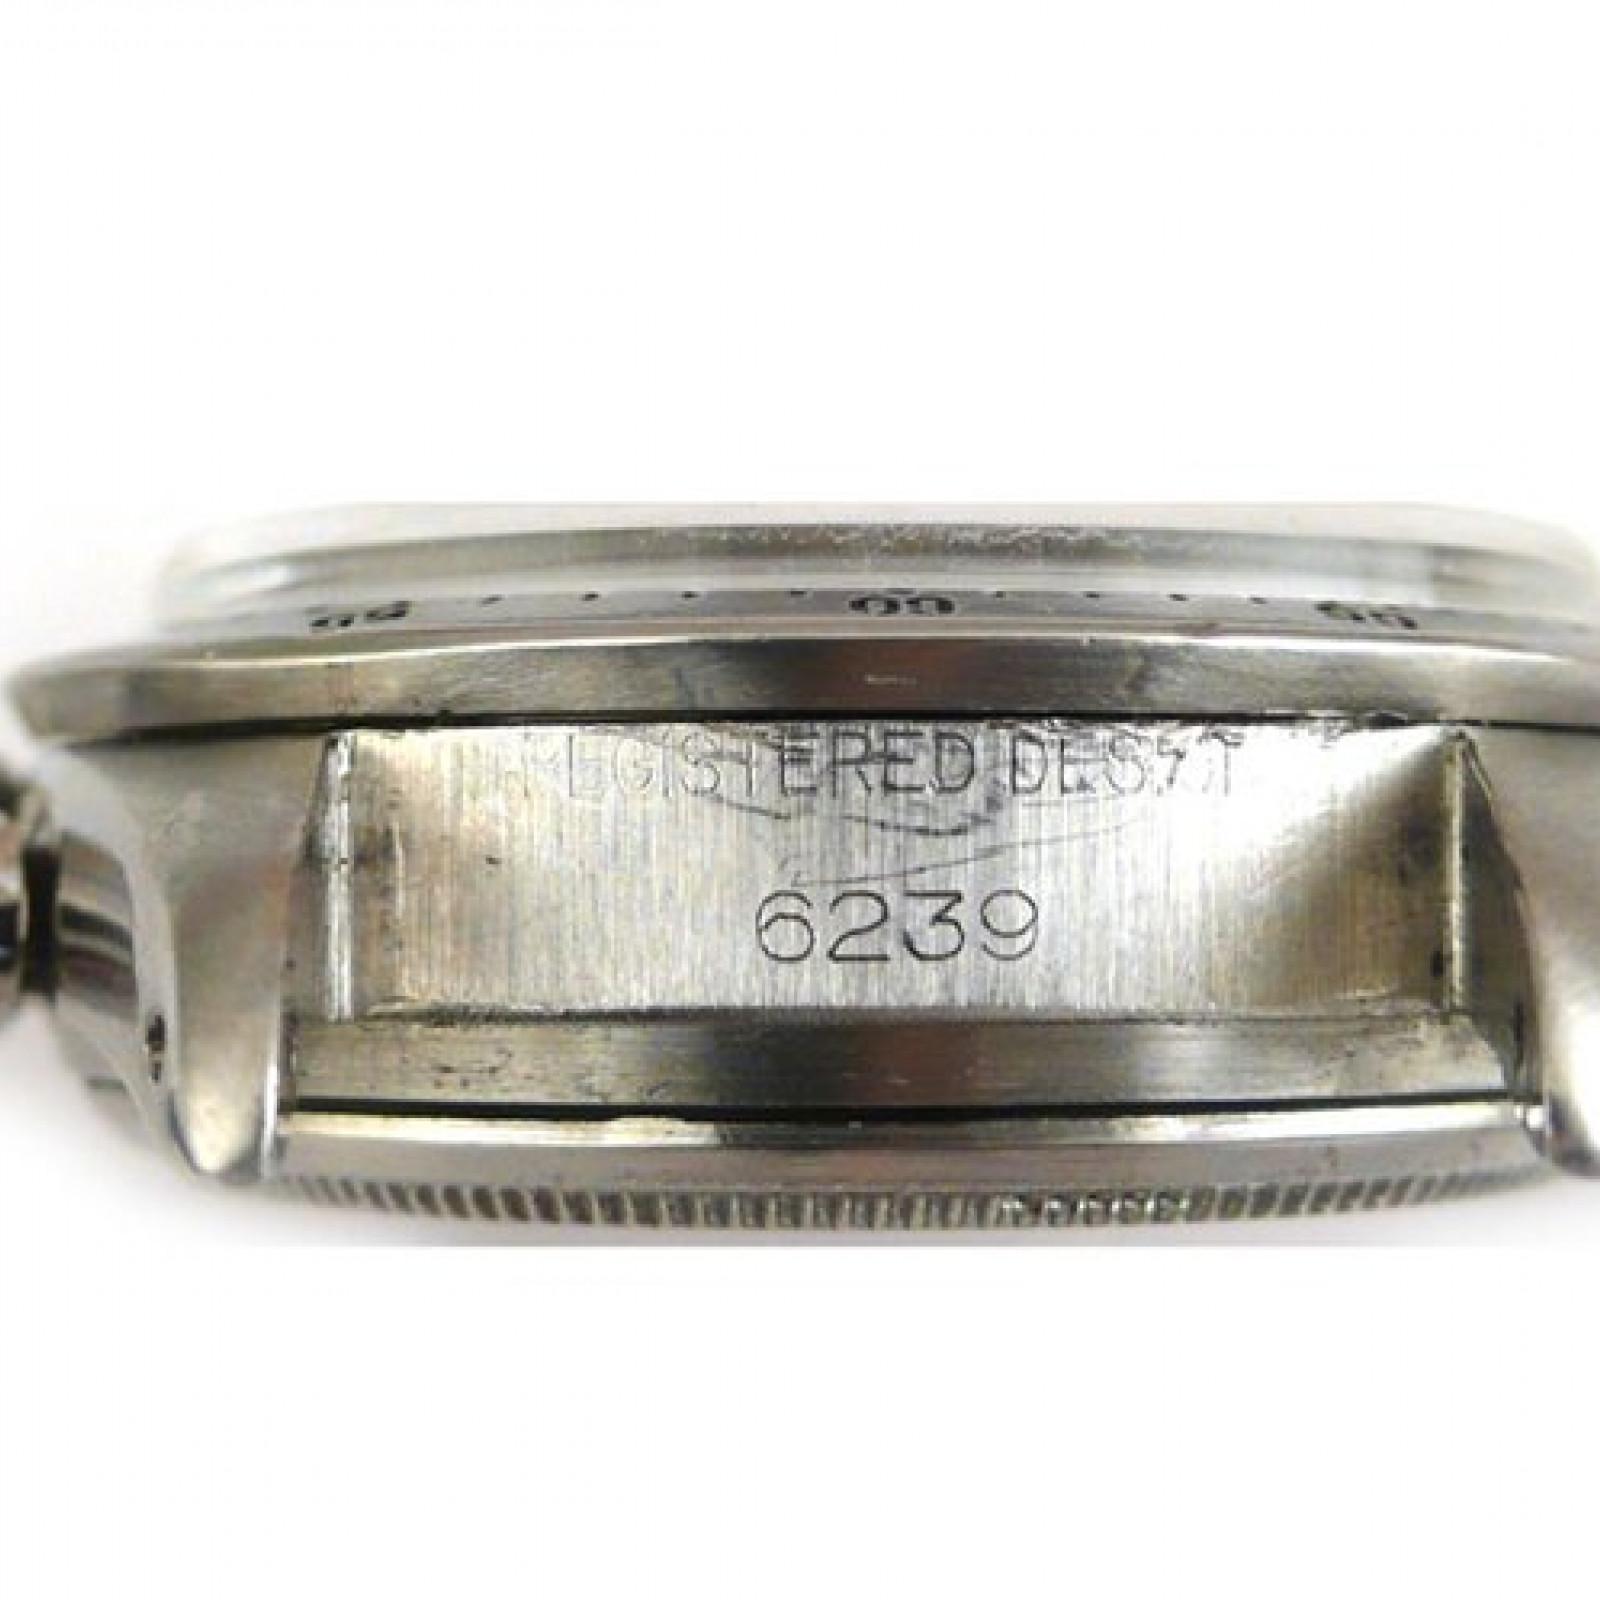 Vintage Rolex Daytona Cosmograph 6239